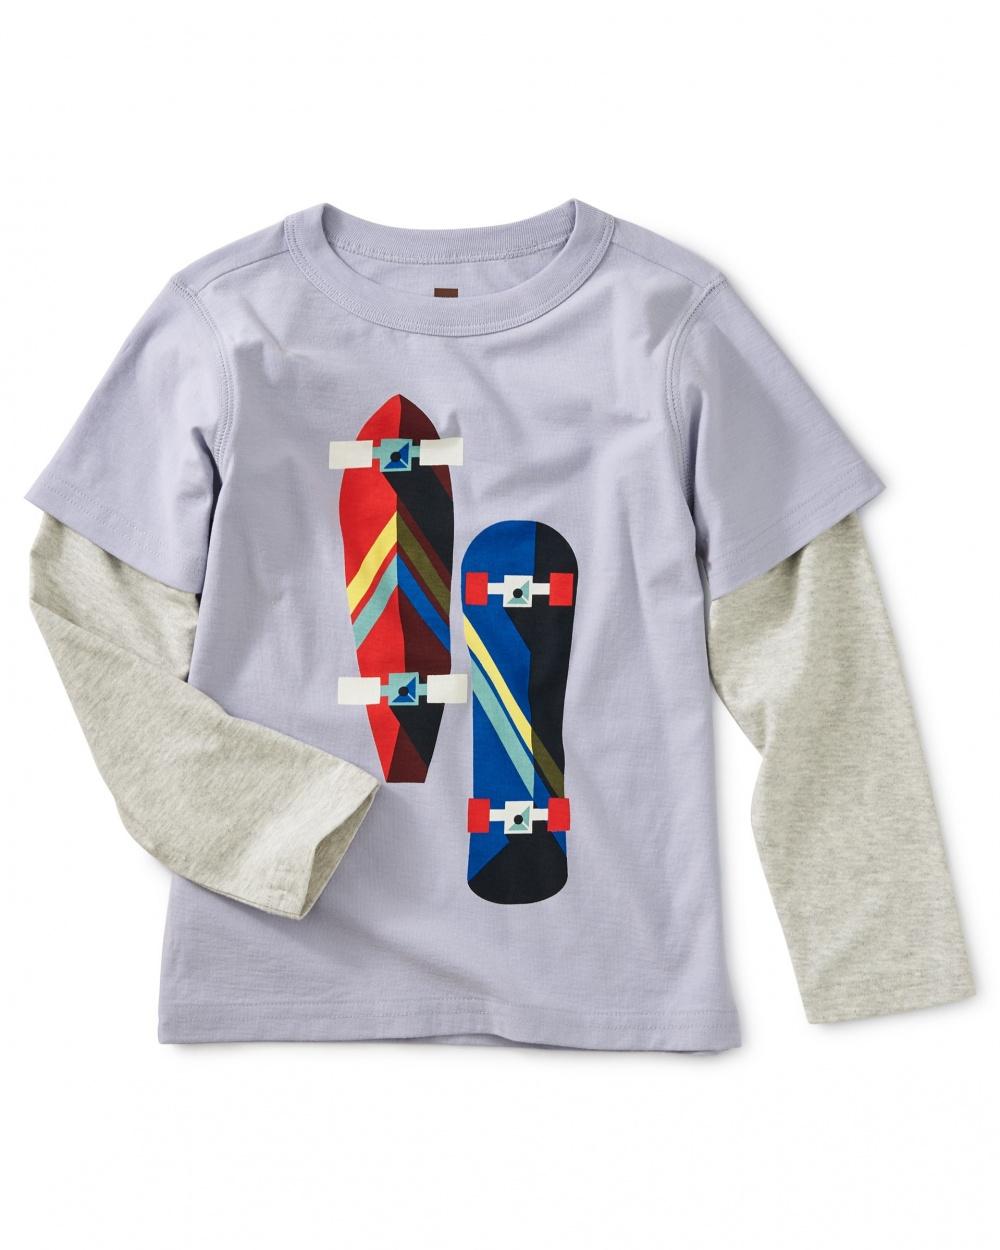 Skate Board Graphic Layered Tee